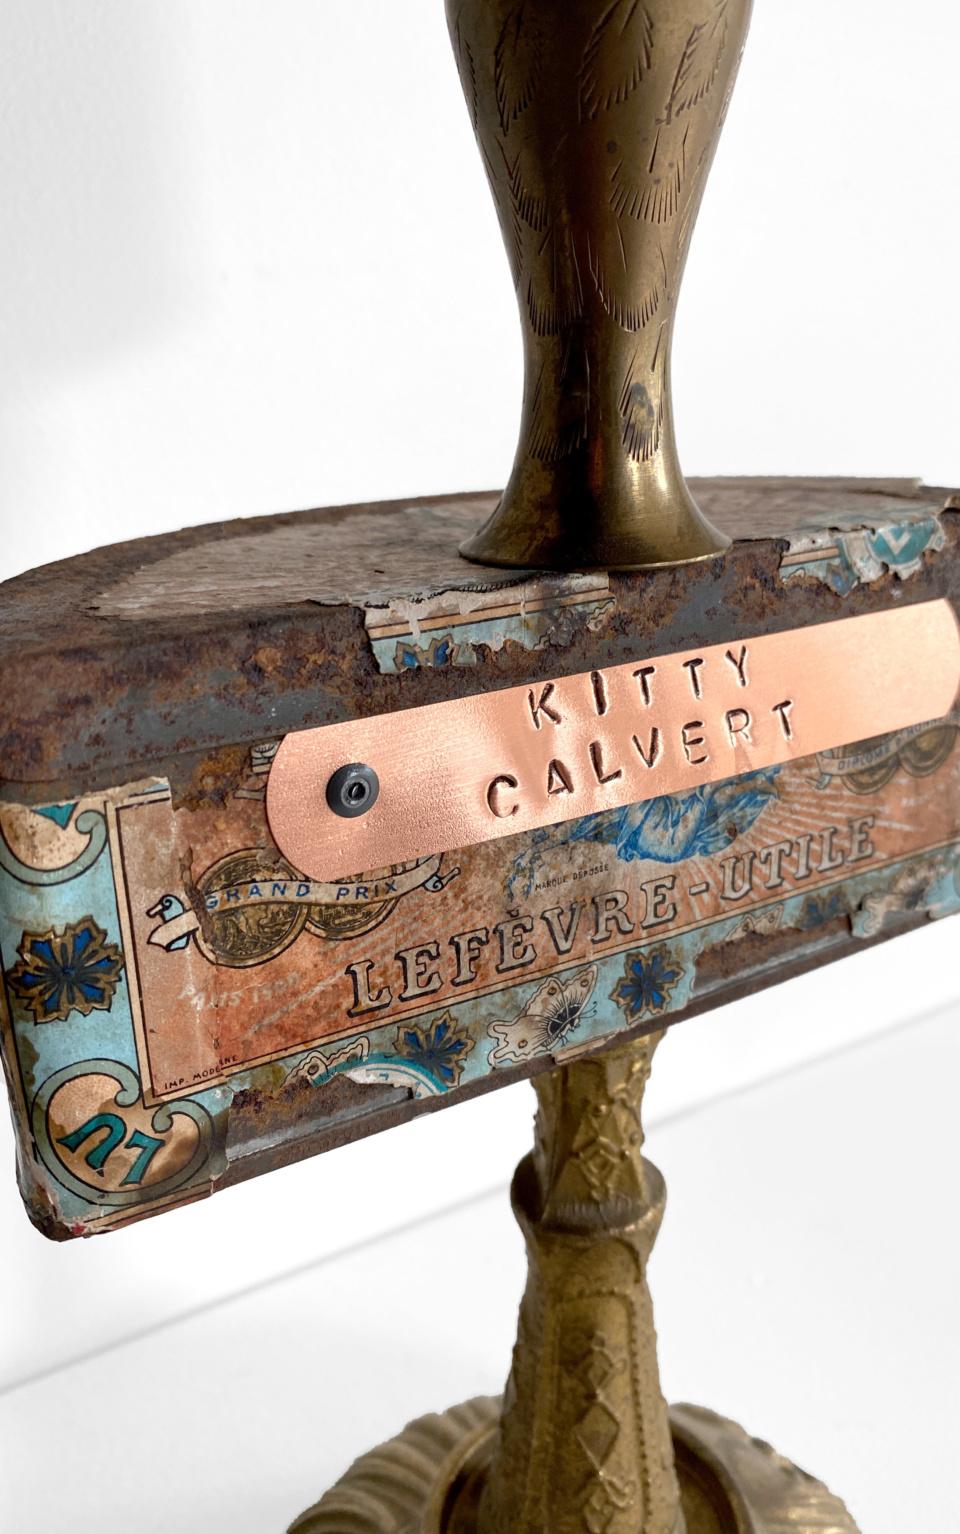 Kitty Calvert Flirty Detail 3